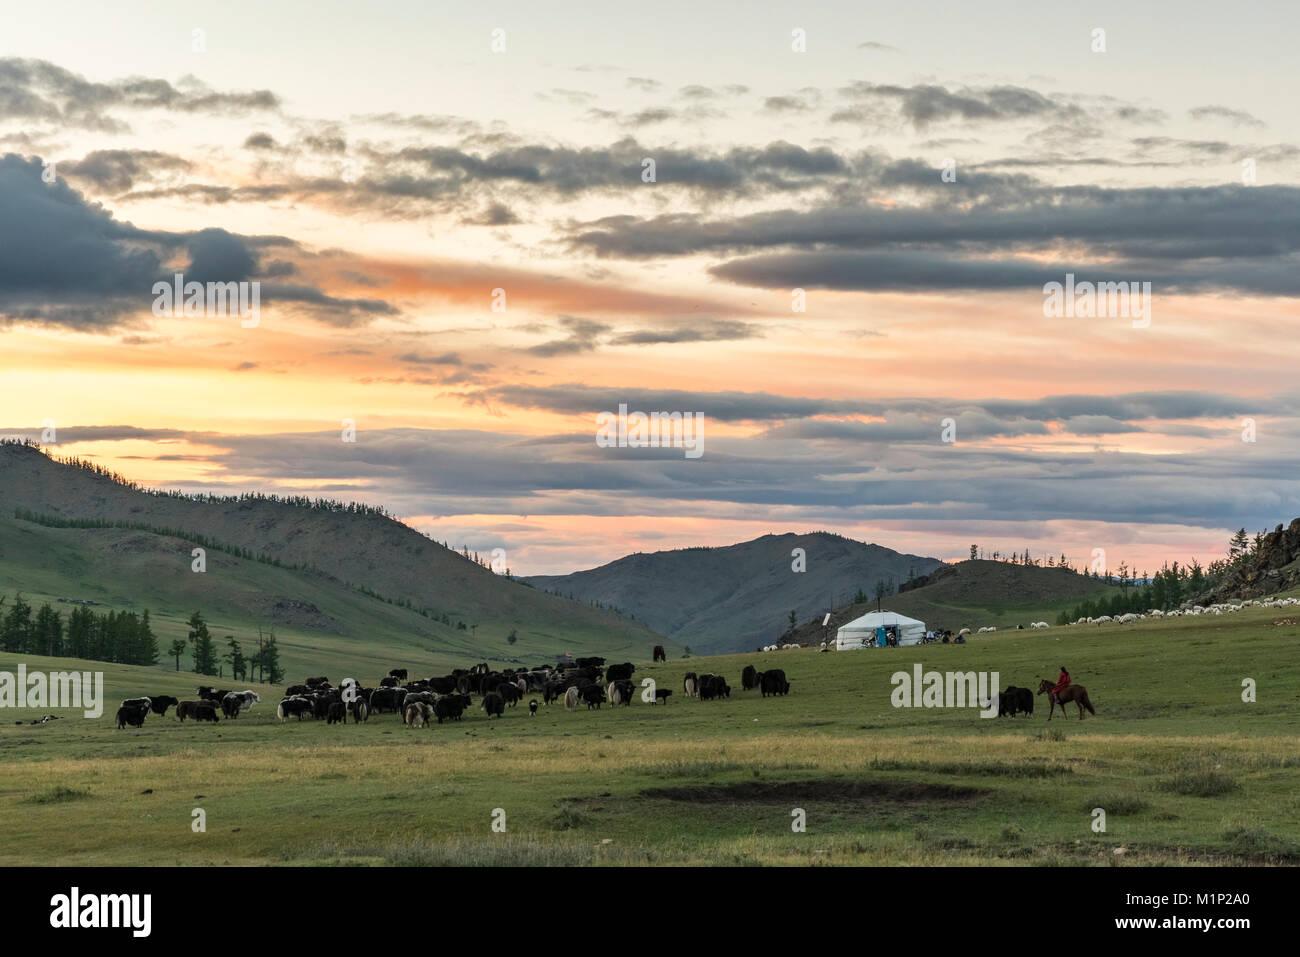 Shepherd on horse rounding up yaks at sunset, Burentogtokh district, Hovsgol province, Mongolia, Central Asia, Asia - Stock Image